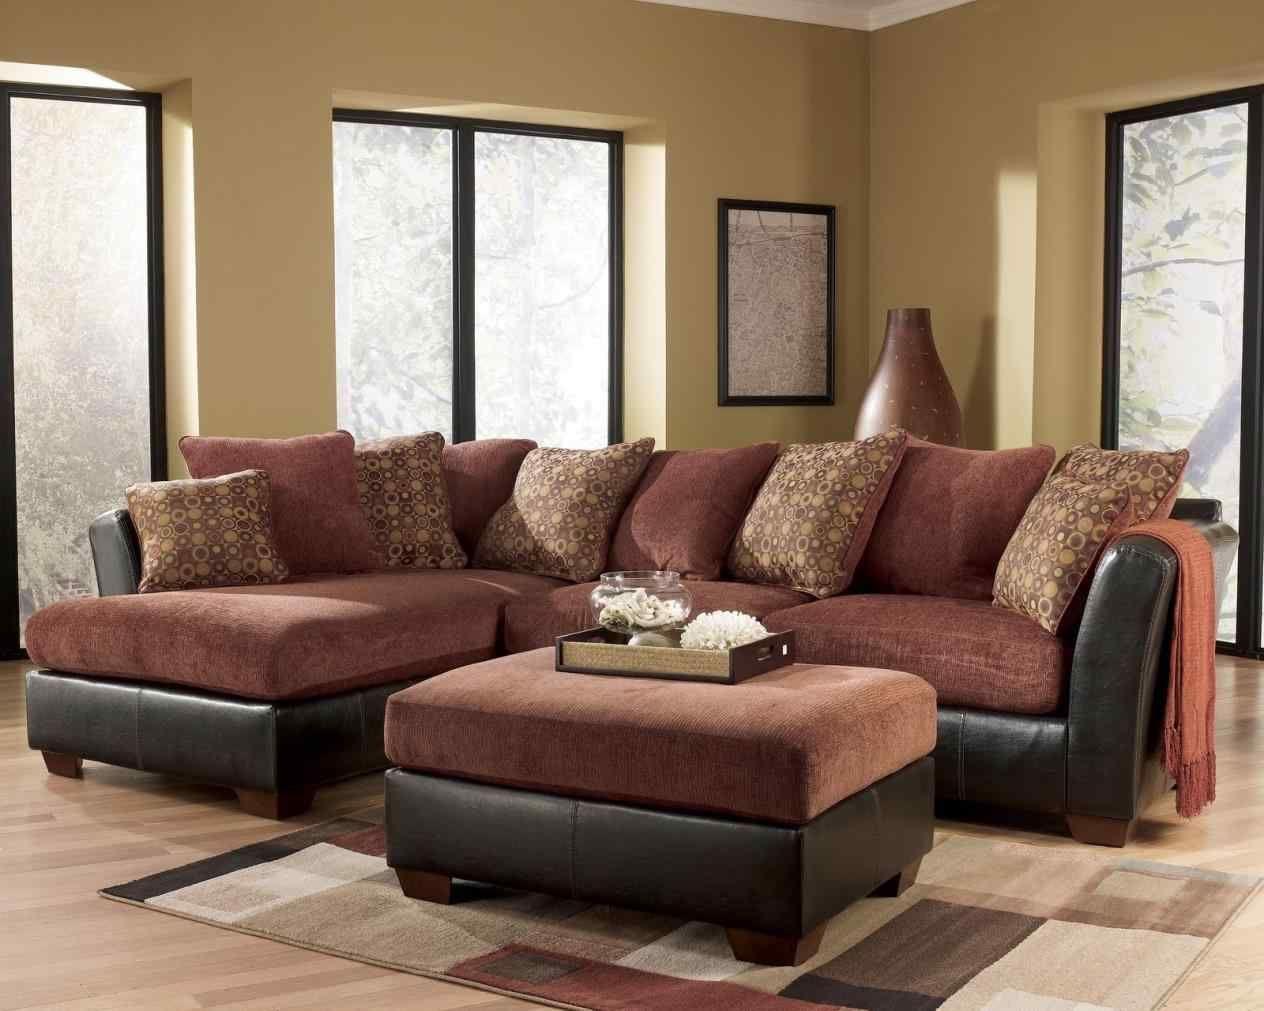 alenya ashley furniture sectional sofa prices quartz collection tan darcy salsa contemporary with sweeping pillow darcy : ashley furniture sectional sofas price - Sectionals, Sofas & Couches